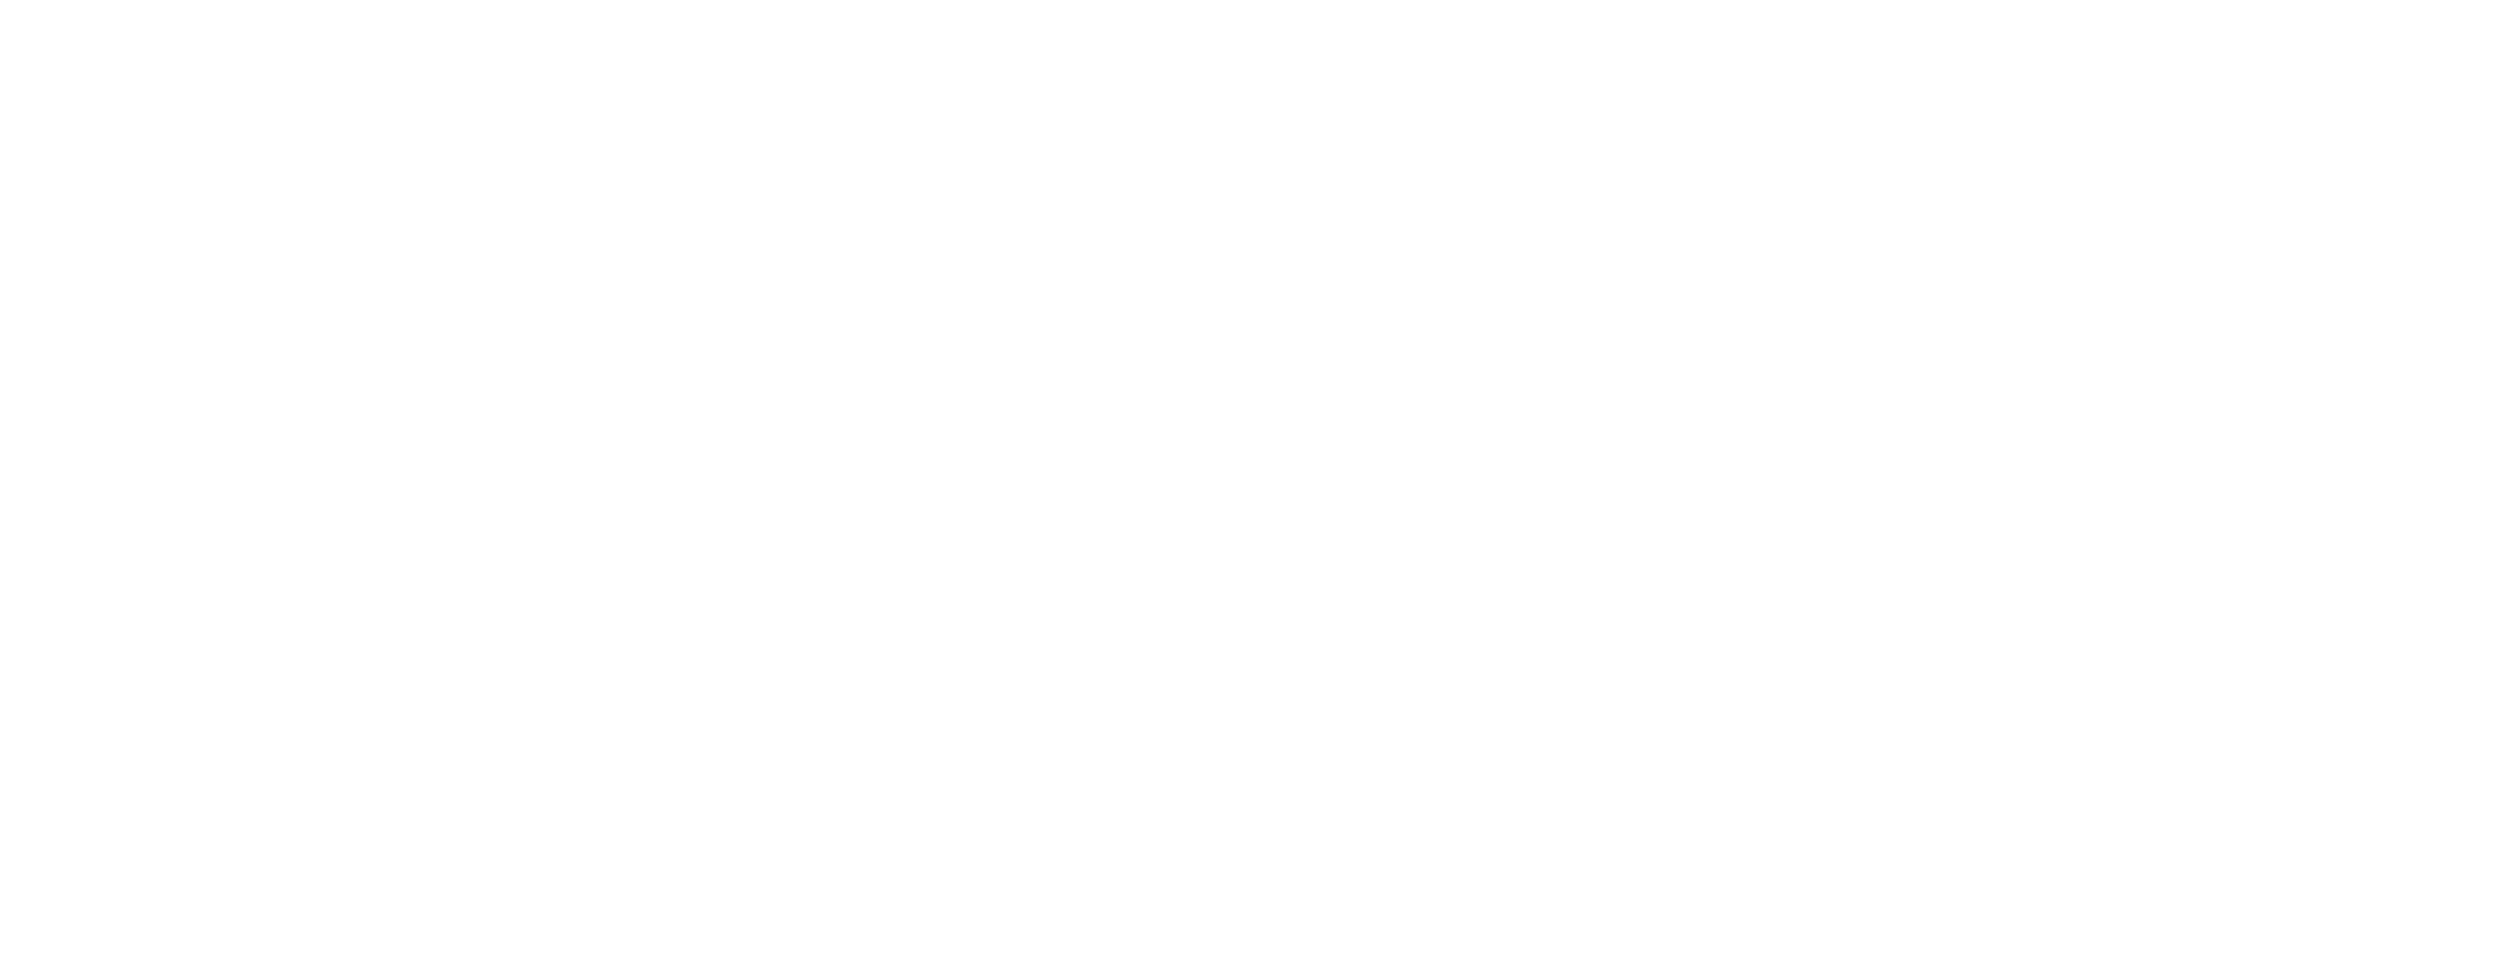 yuwa logo - fish.png